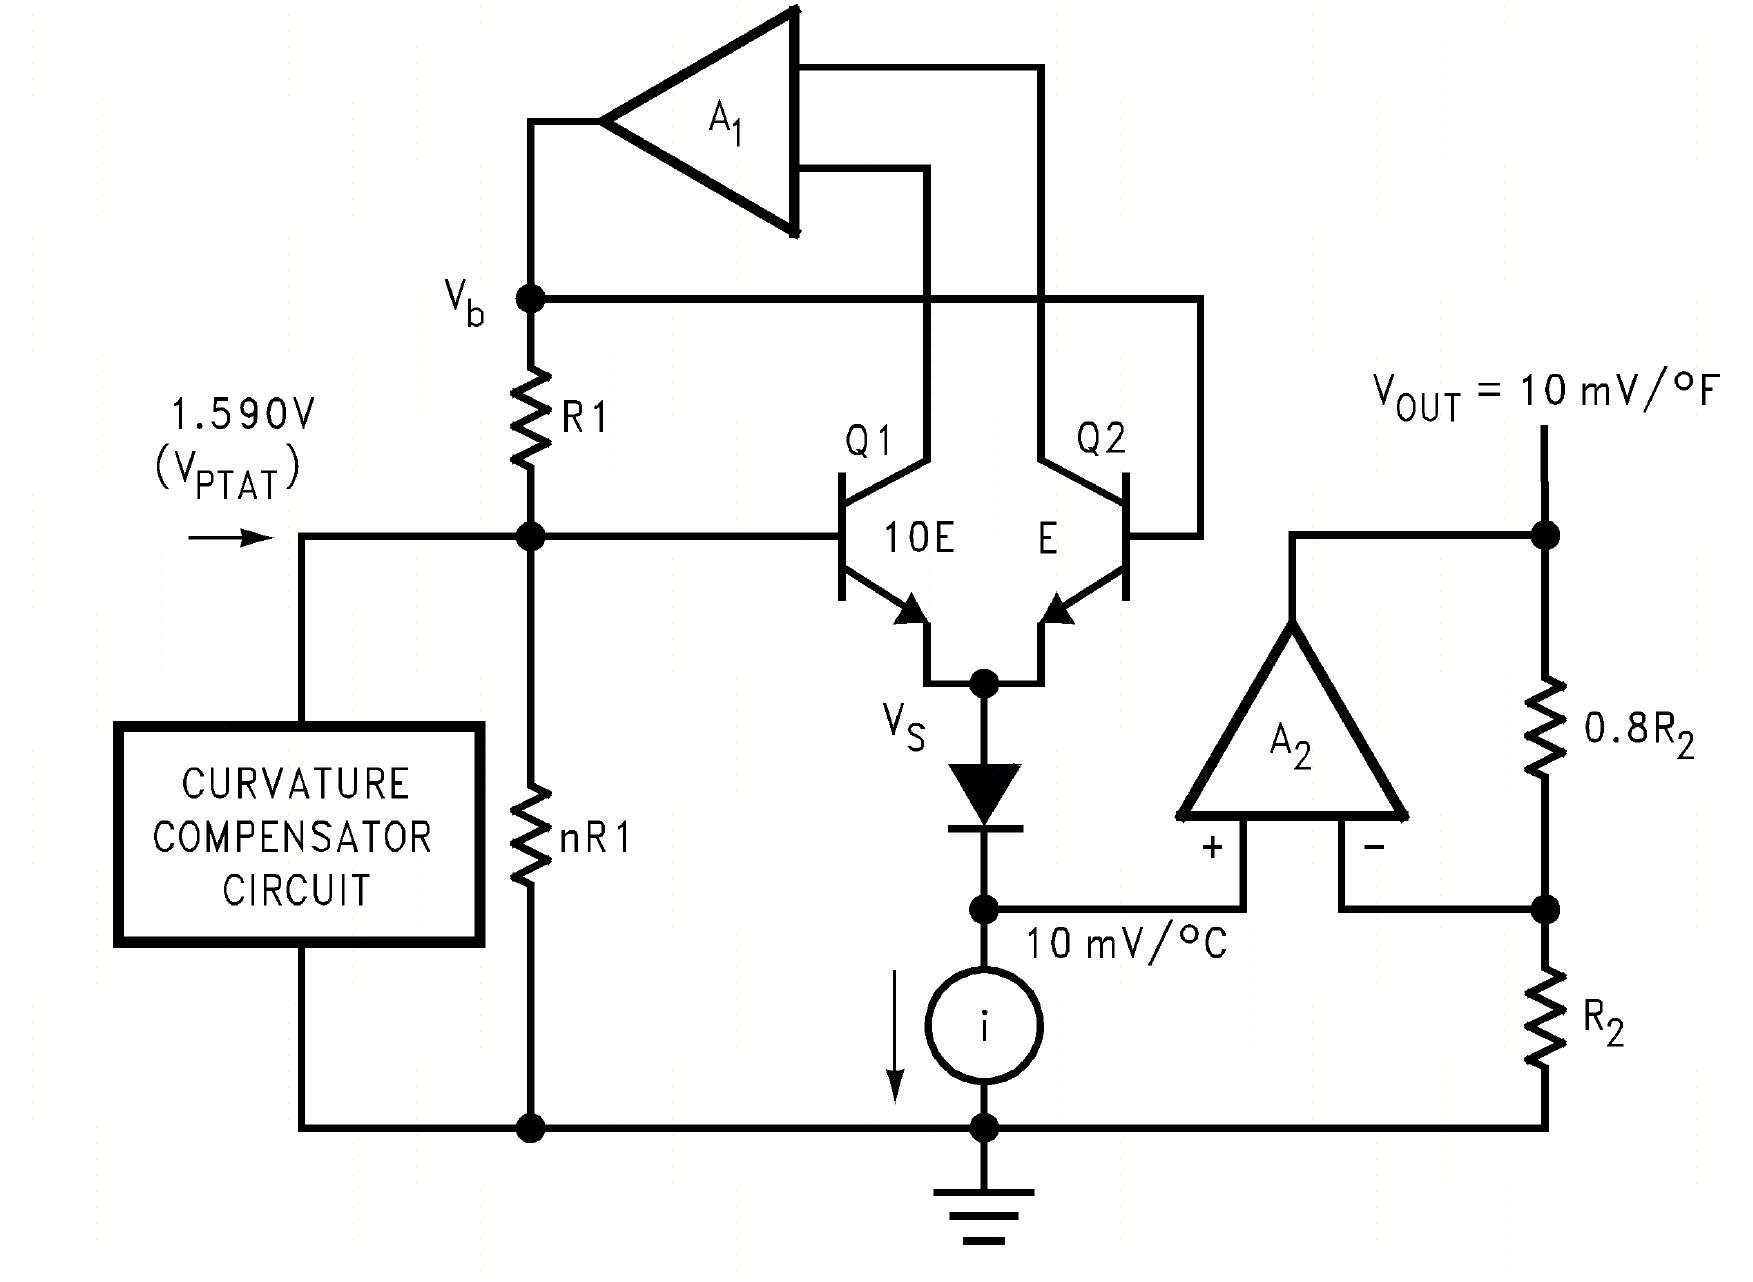 Wiring Diagram for Refrigerator Gate Circuit Diagram Free Download Wiring Diagram Schematic Wiring Of Wiring Diagram for Refrigerator